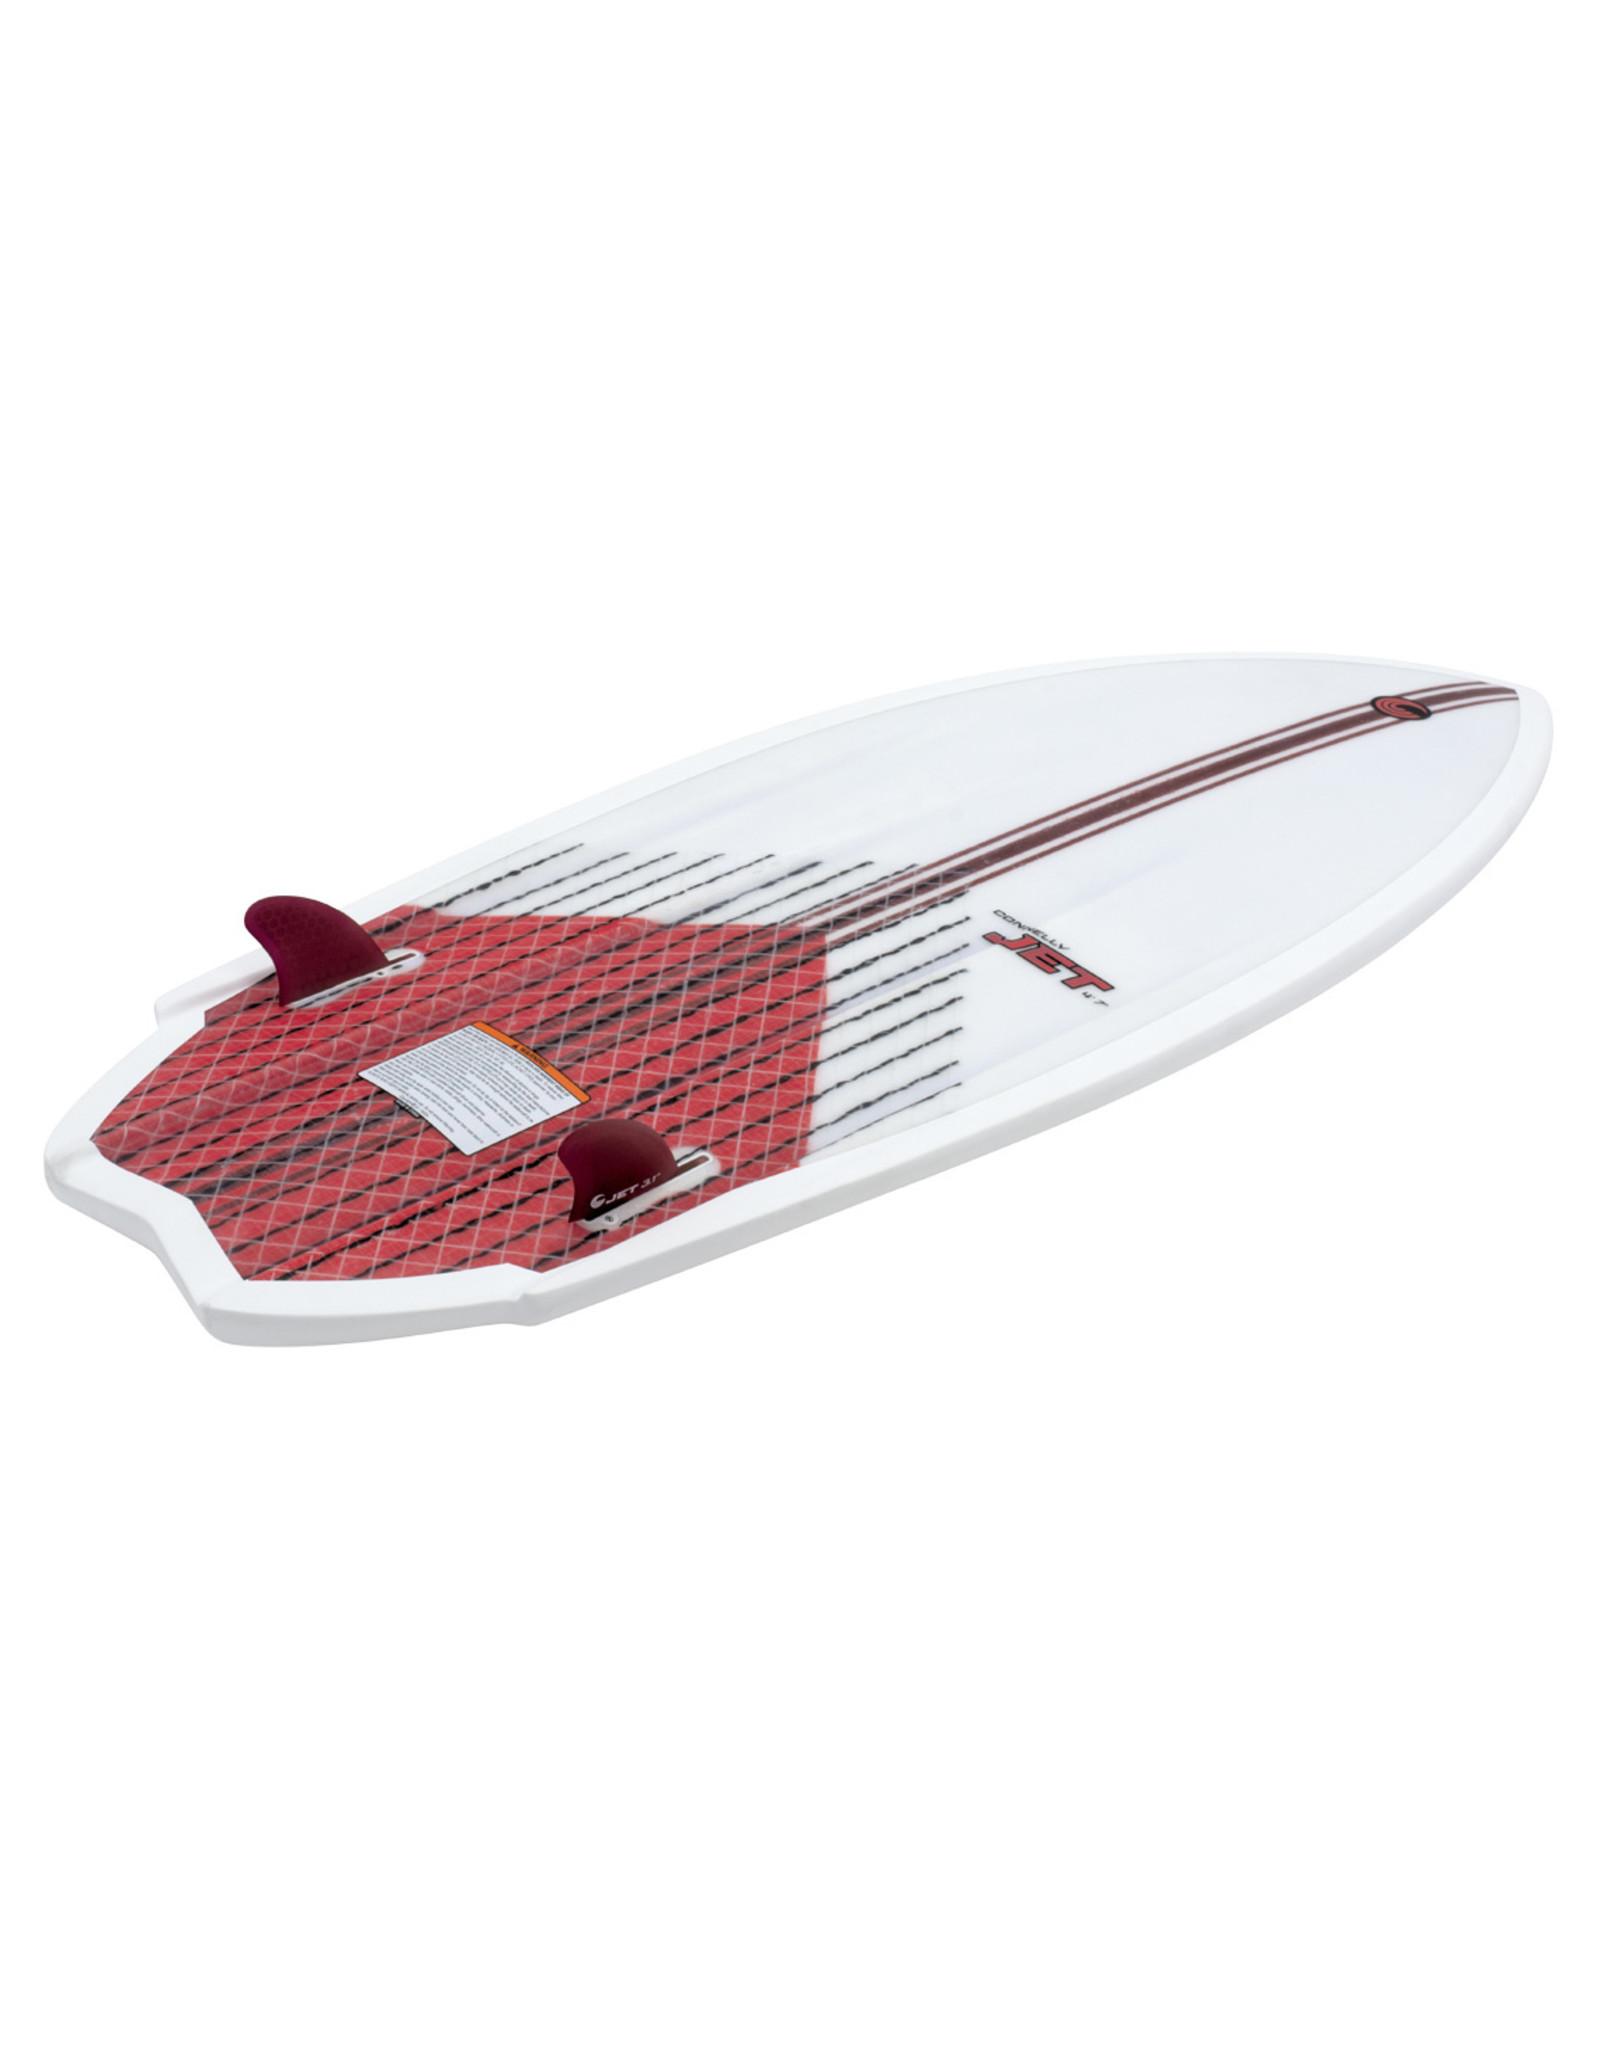 Connelly Jet Wakesurfer 2020